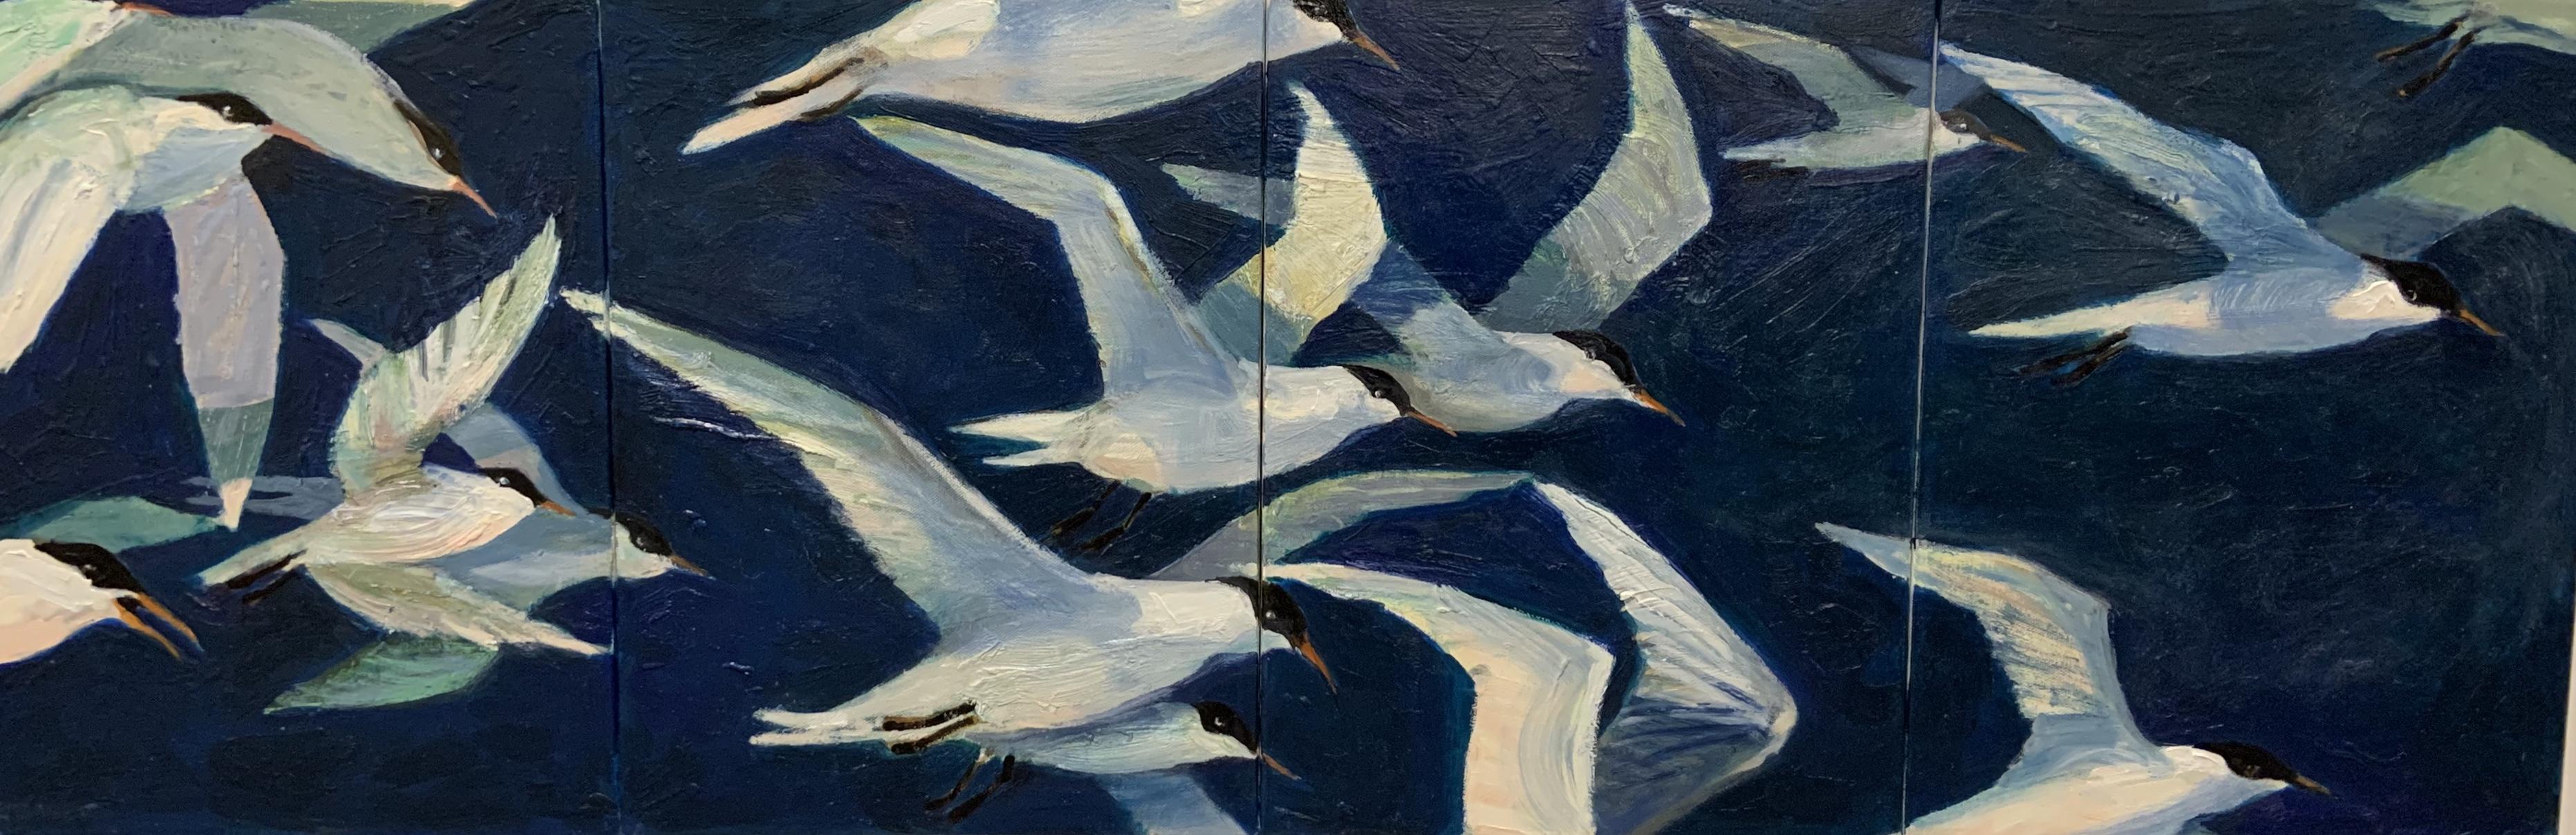 Royal Terns-Garber, oil $2700